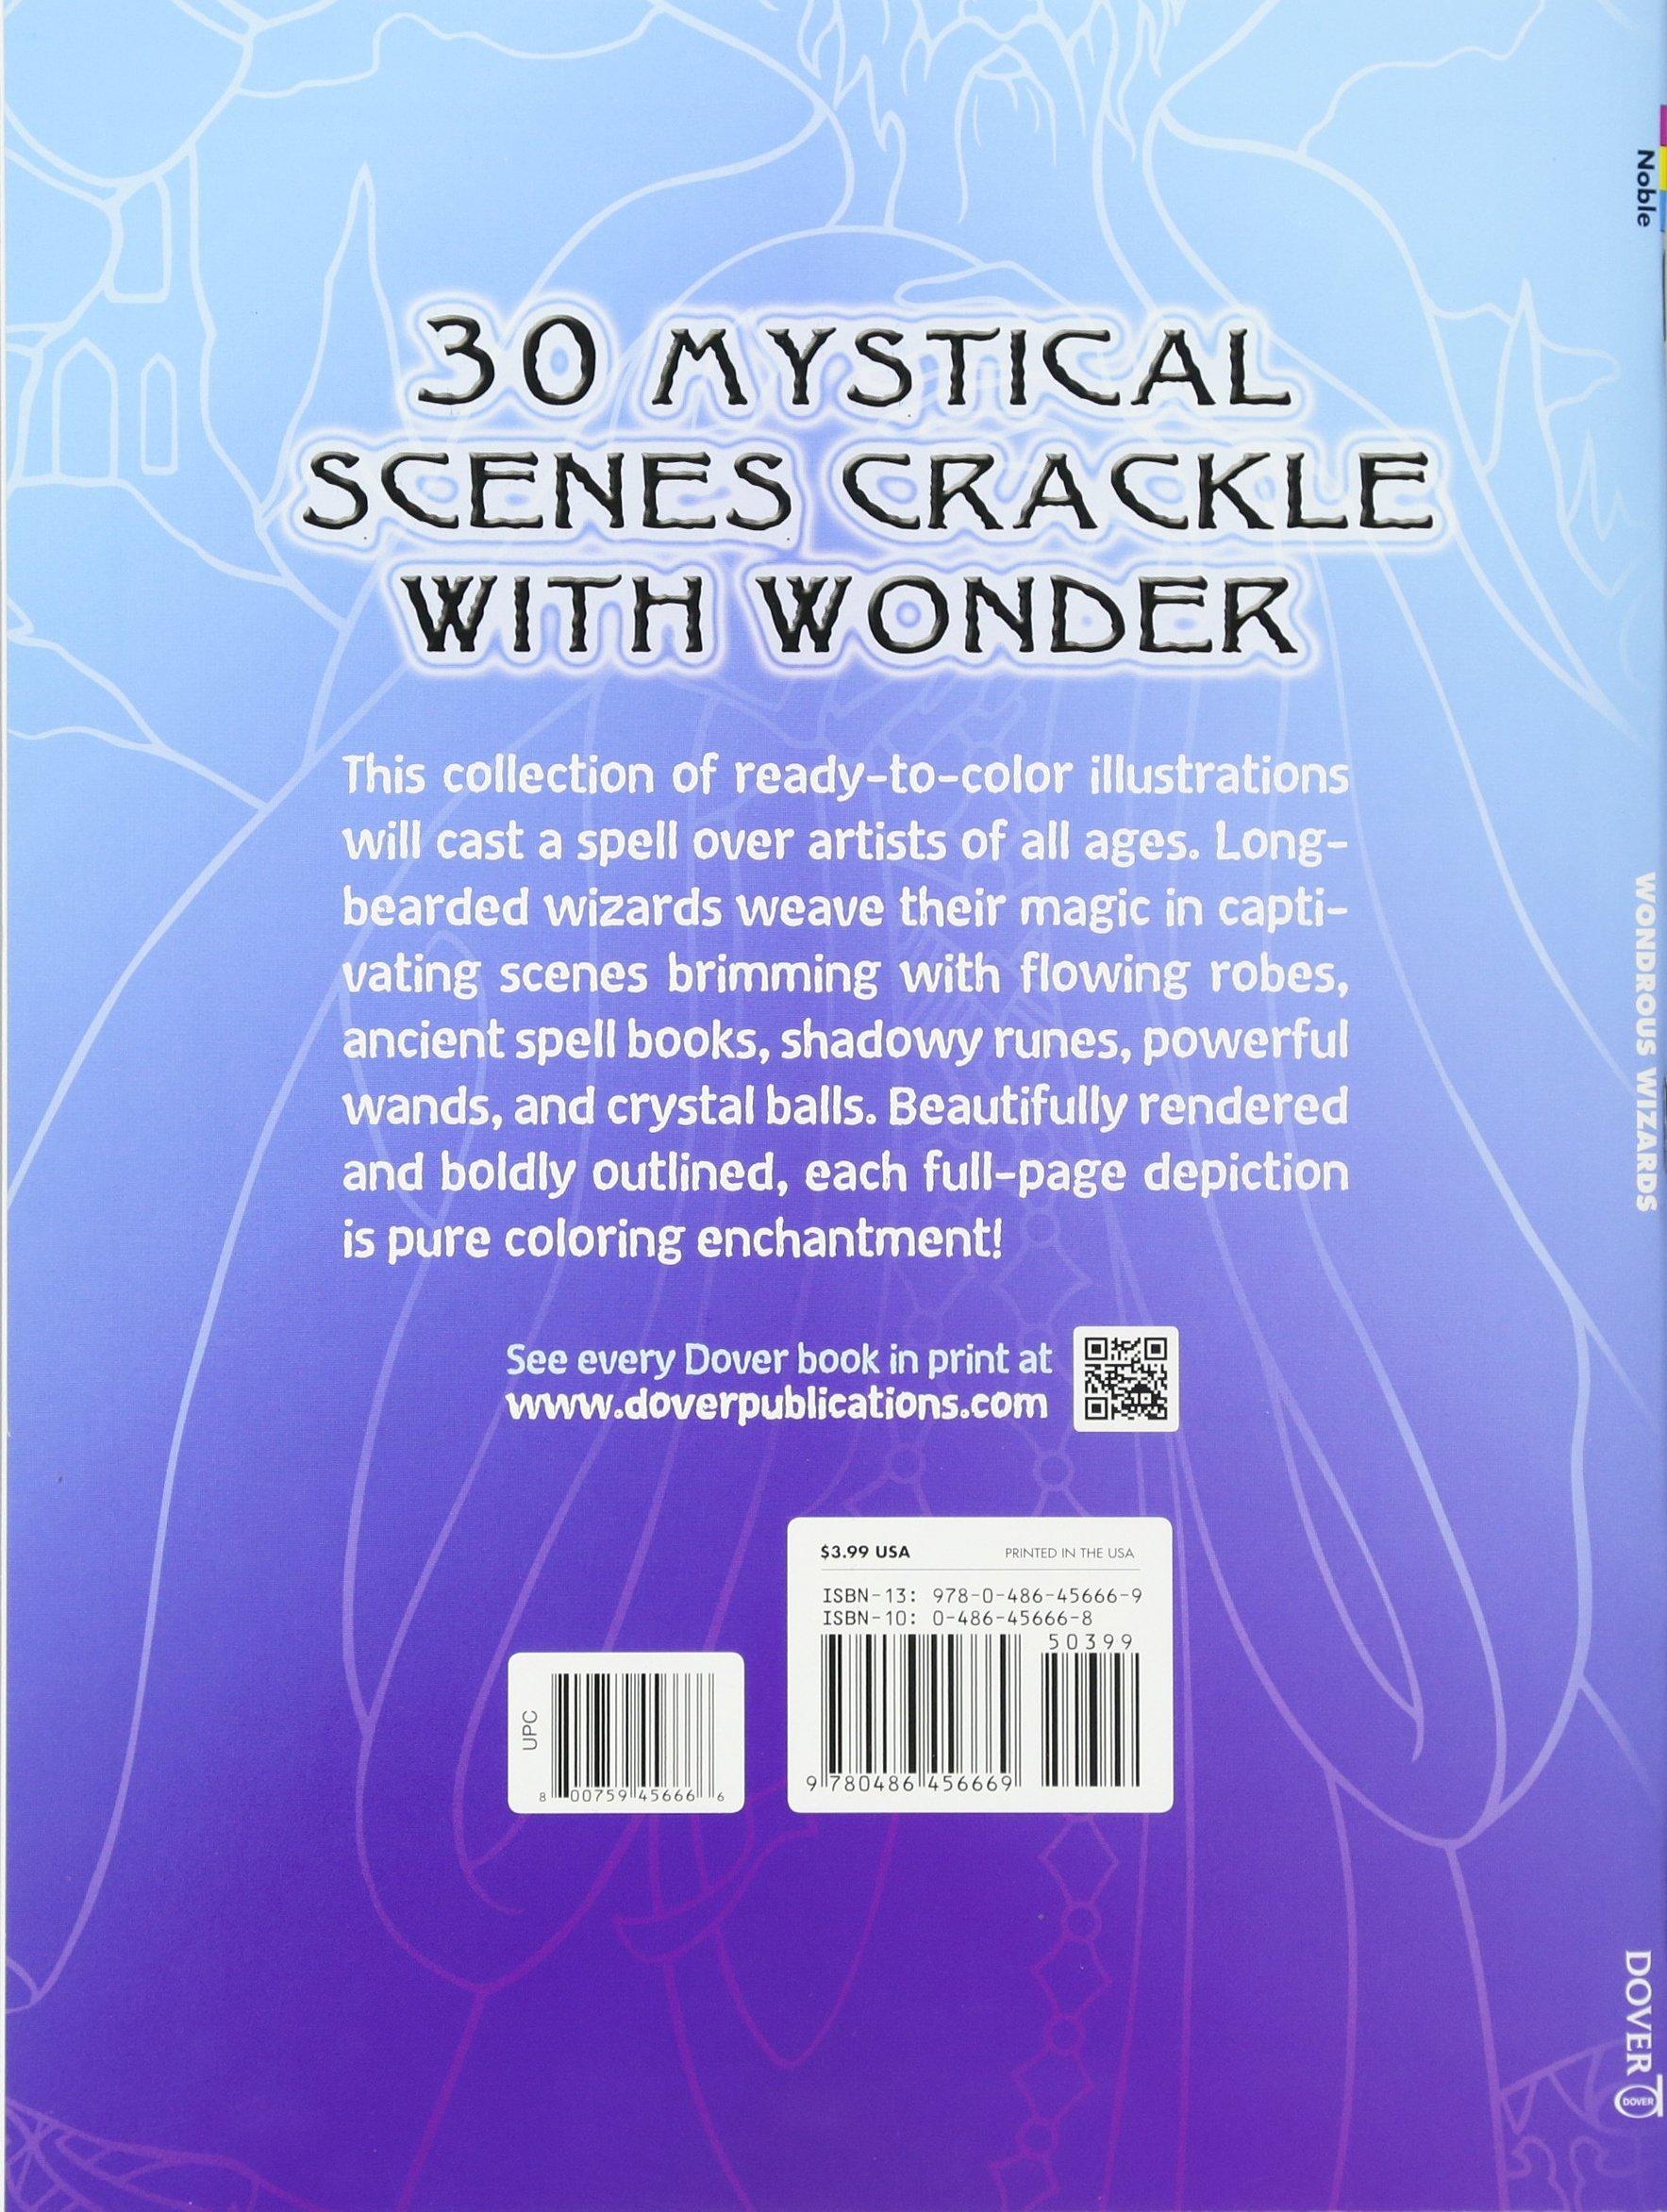 Amazon: Wondrous Wizards (dover Coloring Books) (9780486456669): Marty  Noble: Books